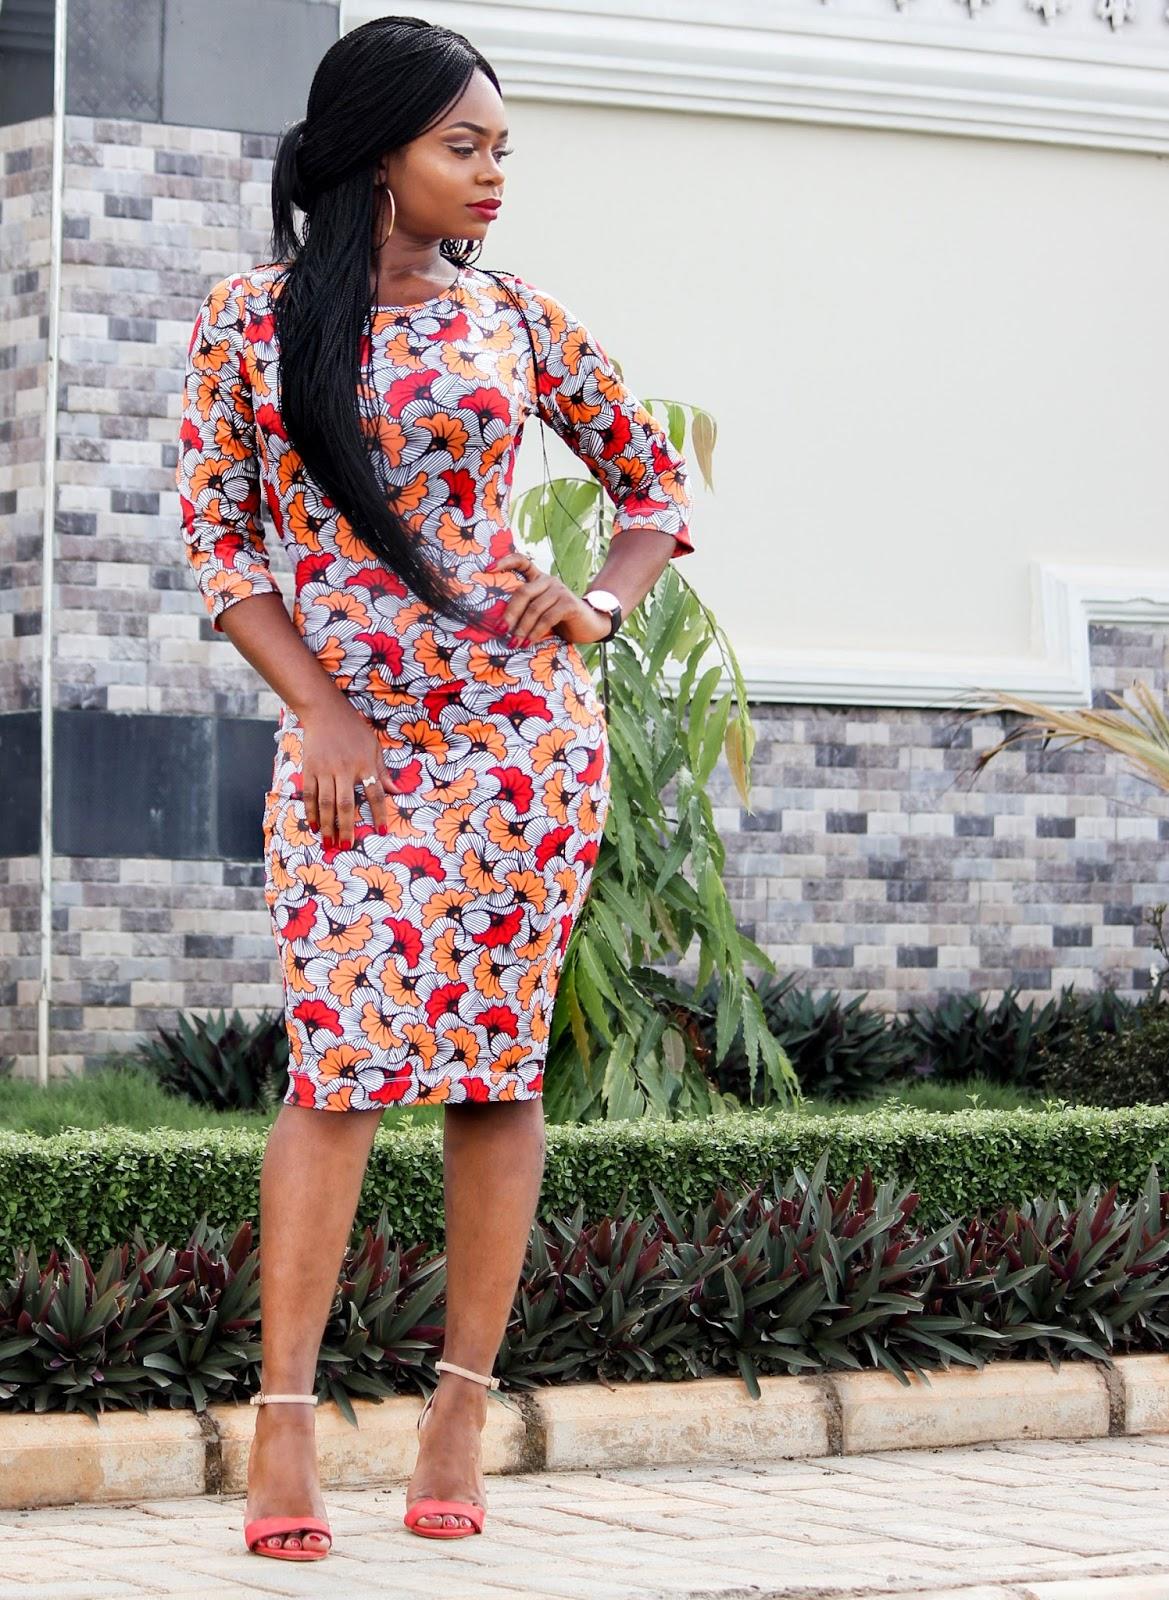 AFRICAN PRINT WITH A TWIST - Zakaara African Custom Stretch Print  Dress  (Kpotuba Print ))